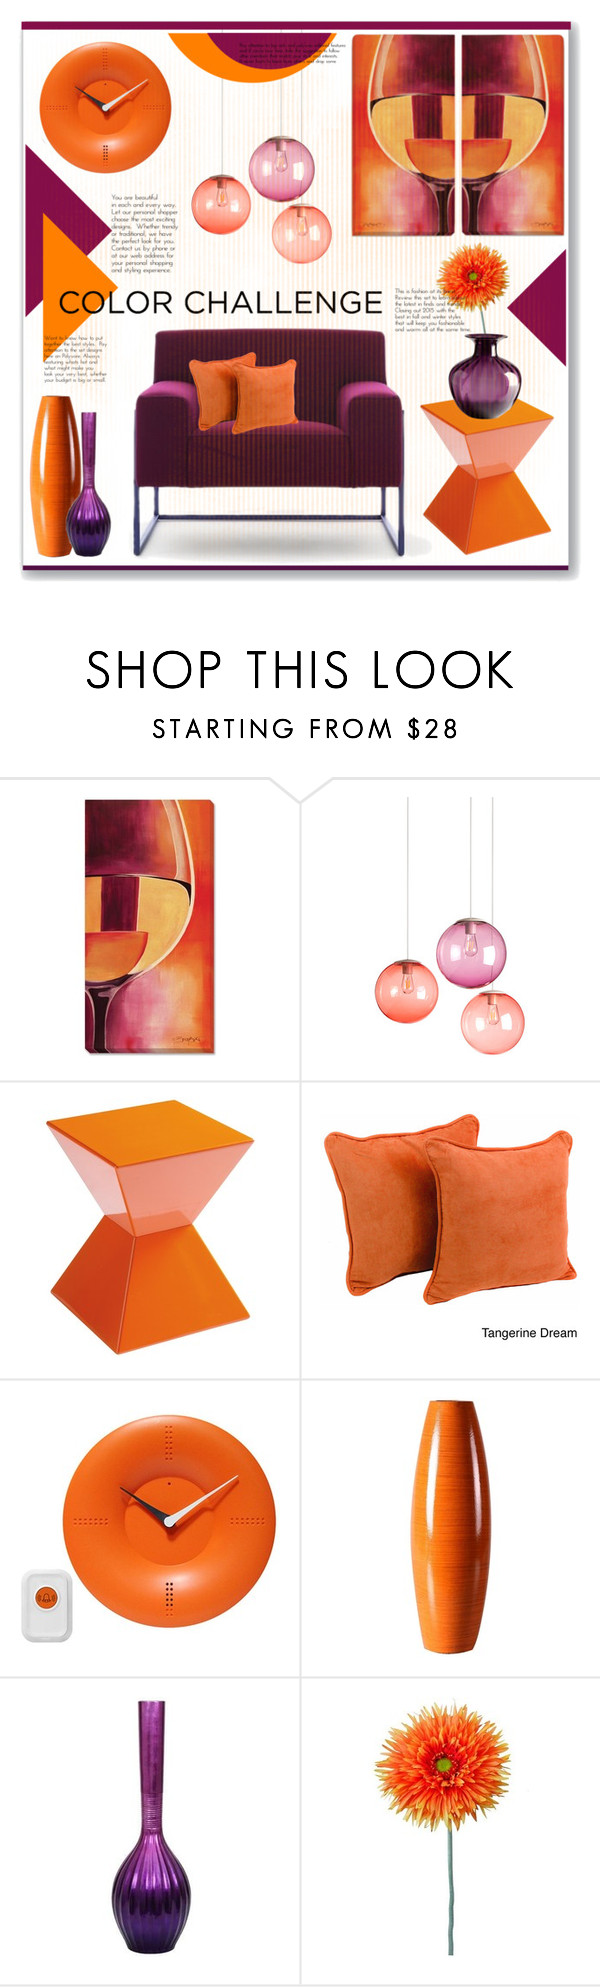 """Orange & purple"" by bogira ❤ liked on Polyvore featuring interior, interiors, interior design, home, home decor, interior decorating, Grandin Road, Fatboy, Sunpan and Blazing Needles"